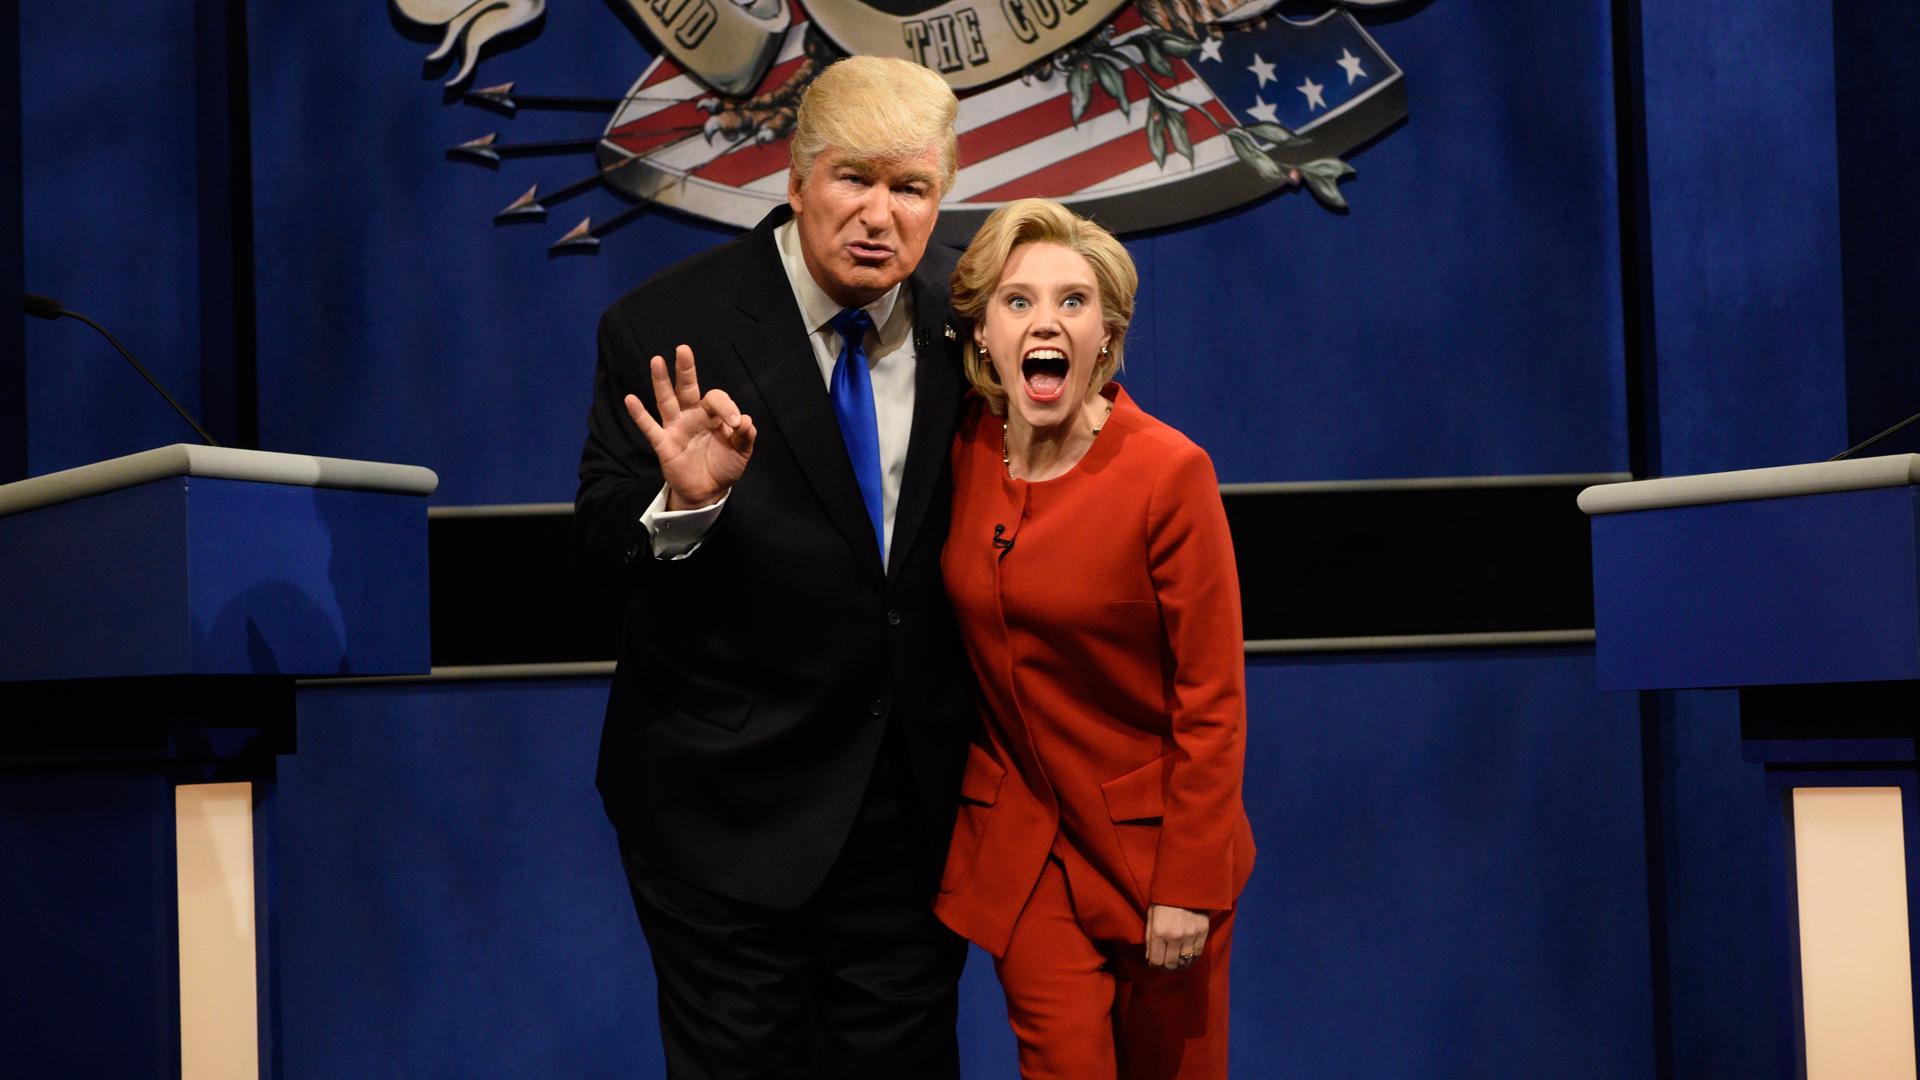 161002_3108903_donald_trump_vs__hillary_clinton_debate_cold